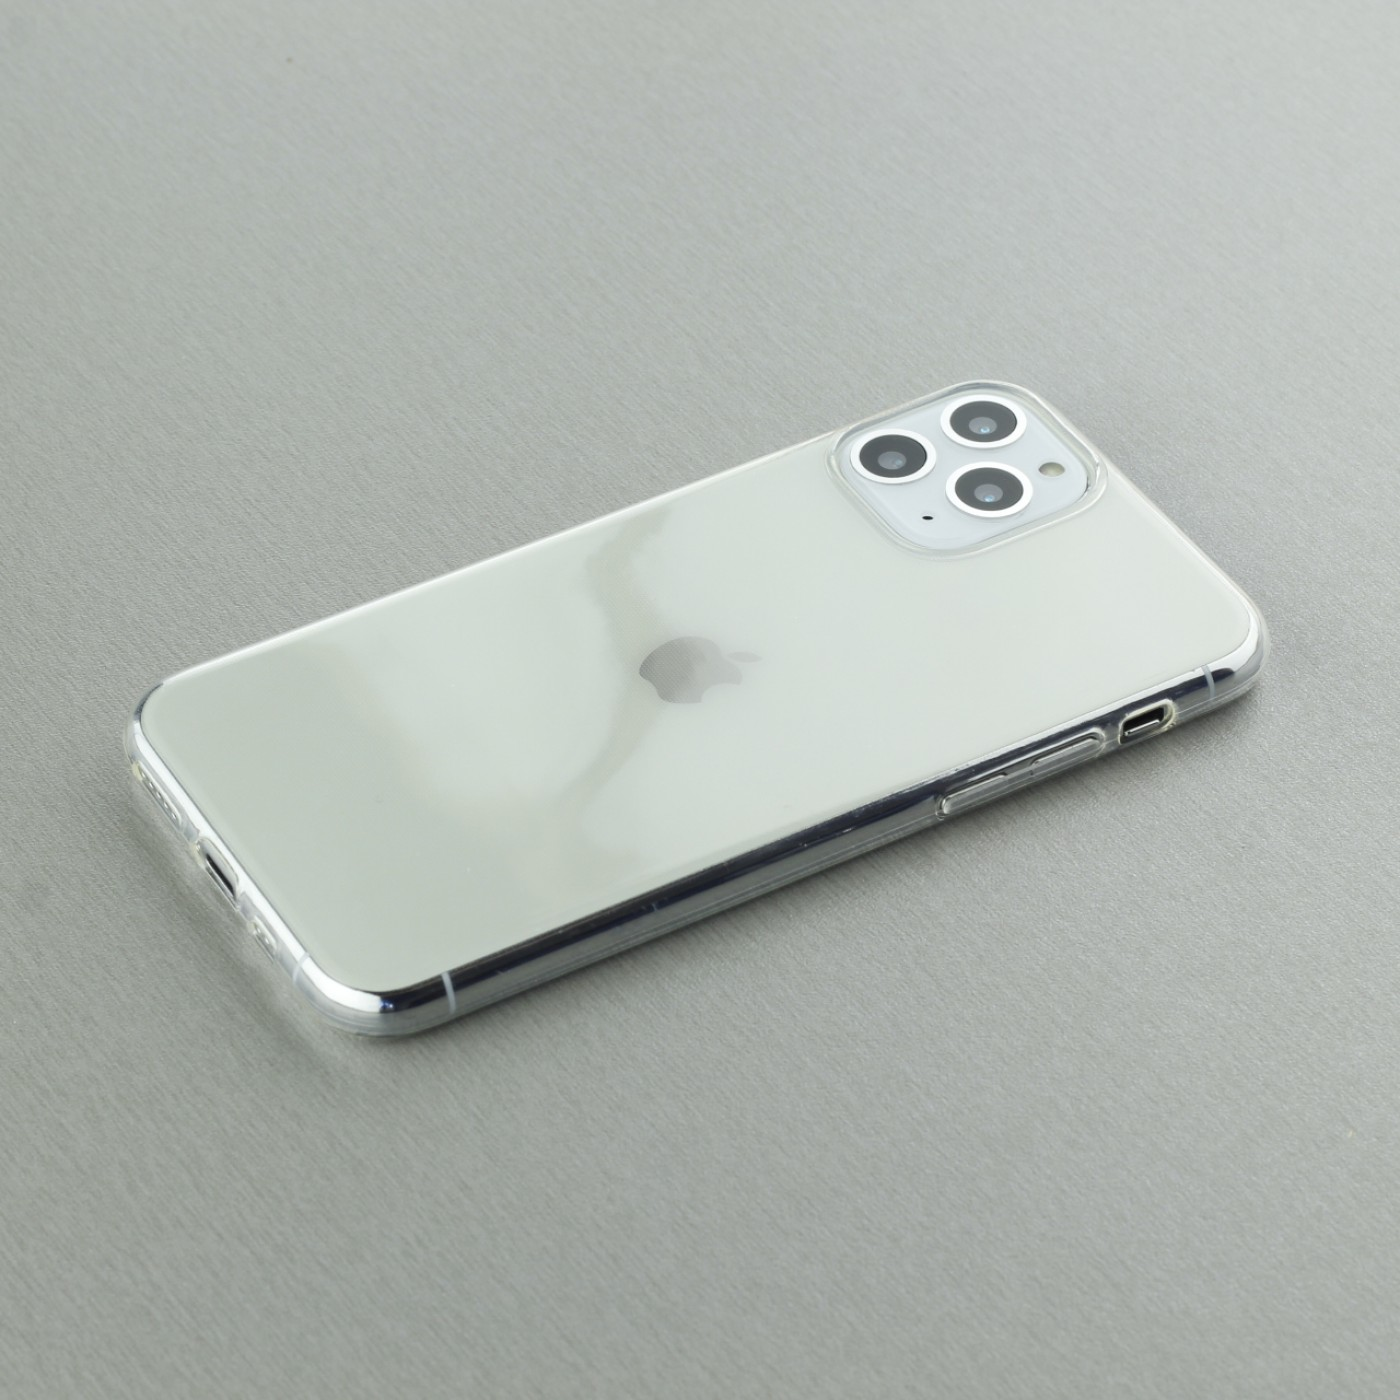 Coque iPhone 11 Pro - Ultra-thin gel transparent